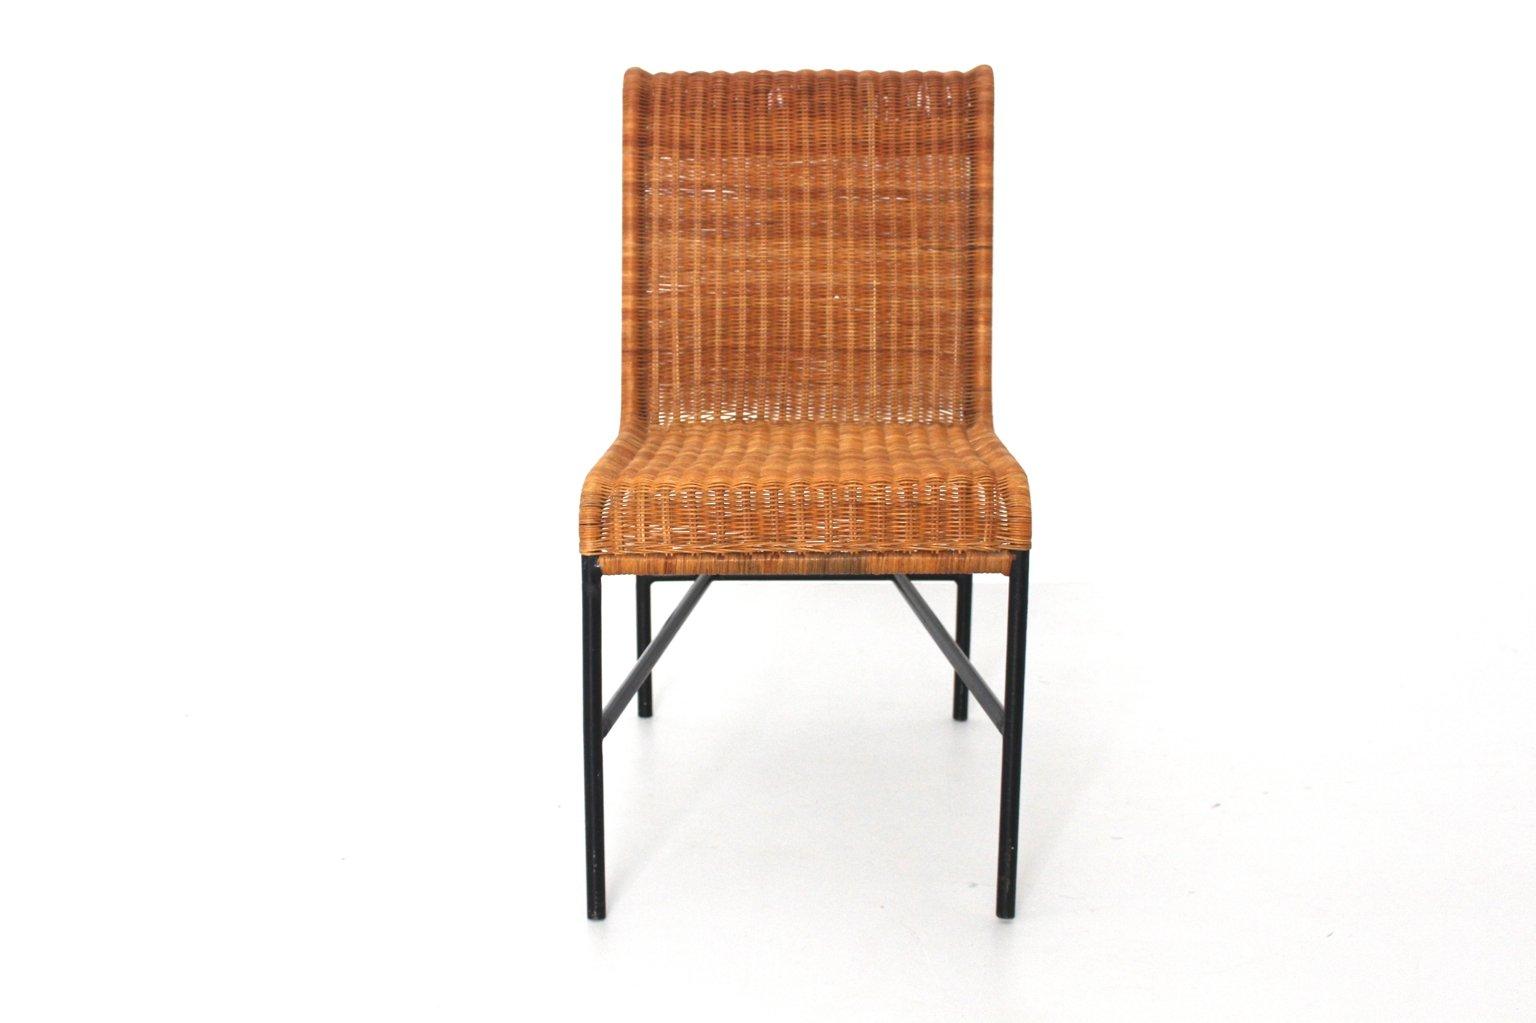 Rattan Esszimmerstühle mid century modern rattan stuhl harold cohen davis pratt 1953